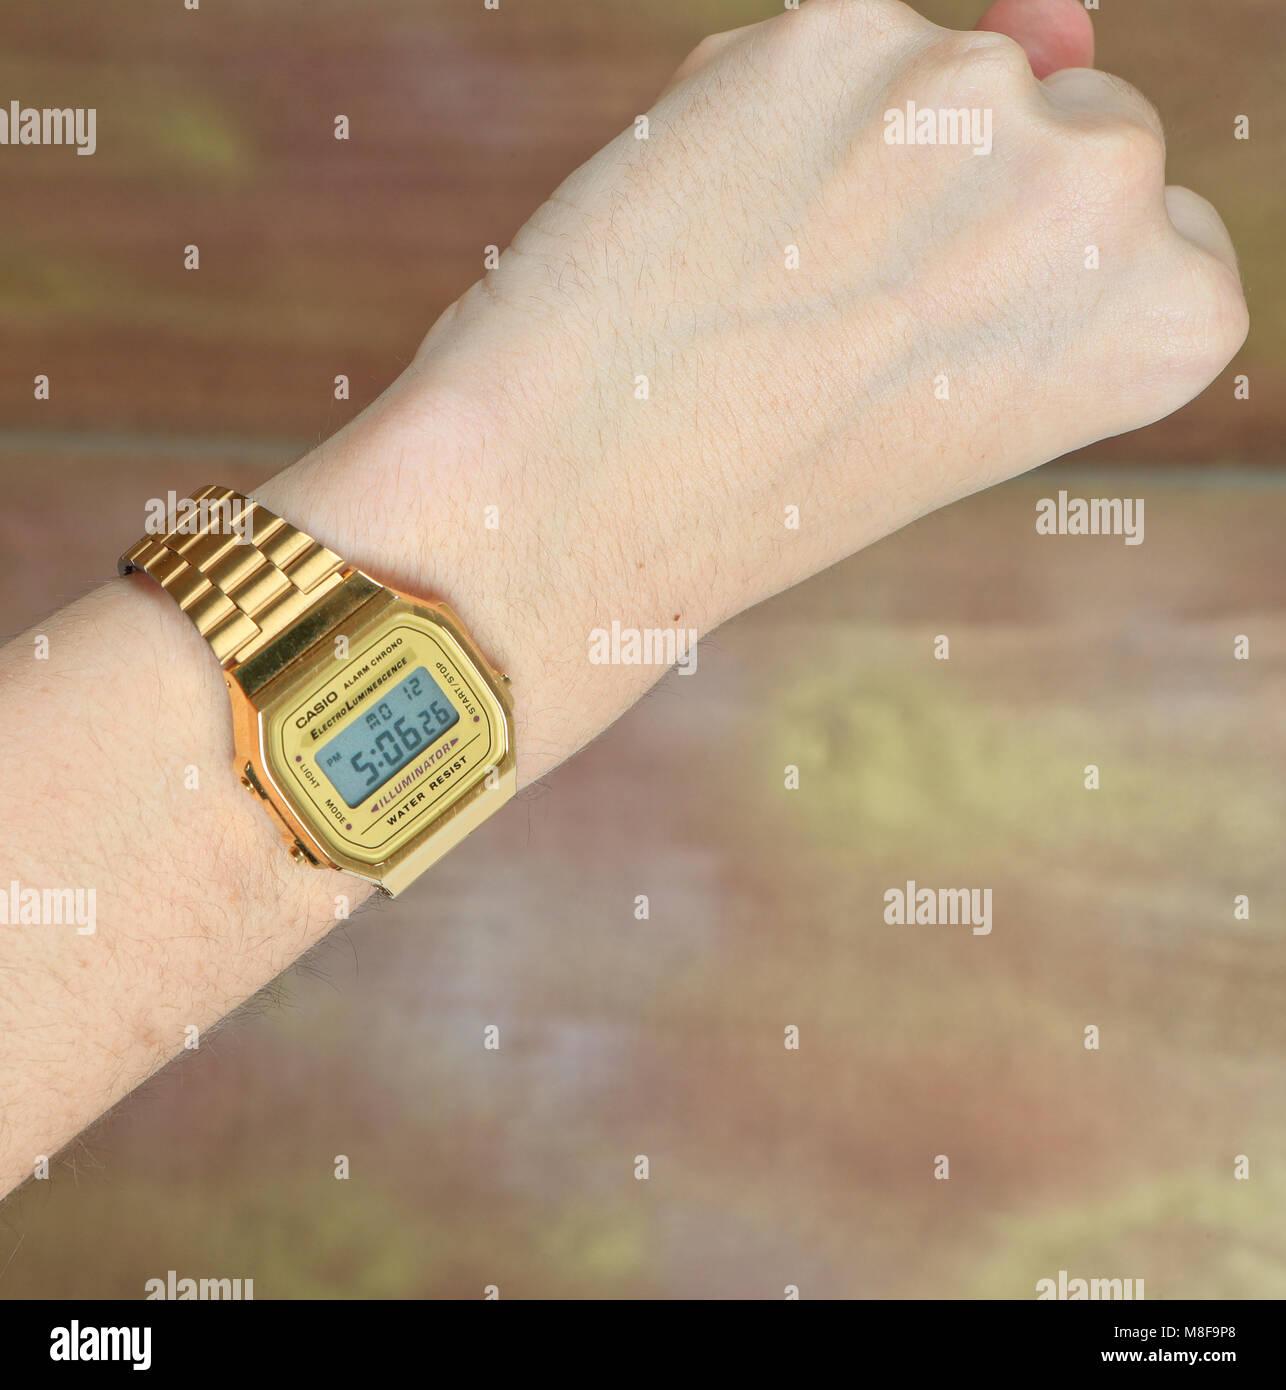 A man's arm wearing a wrist watch - Stock Image